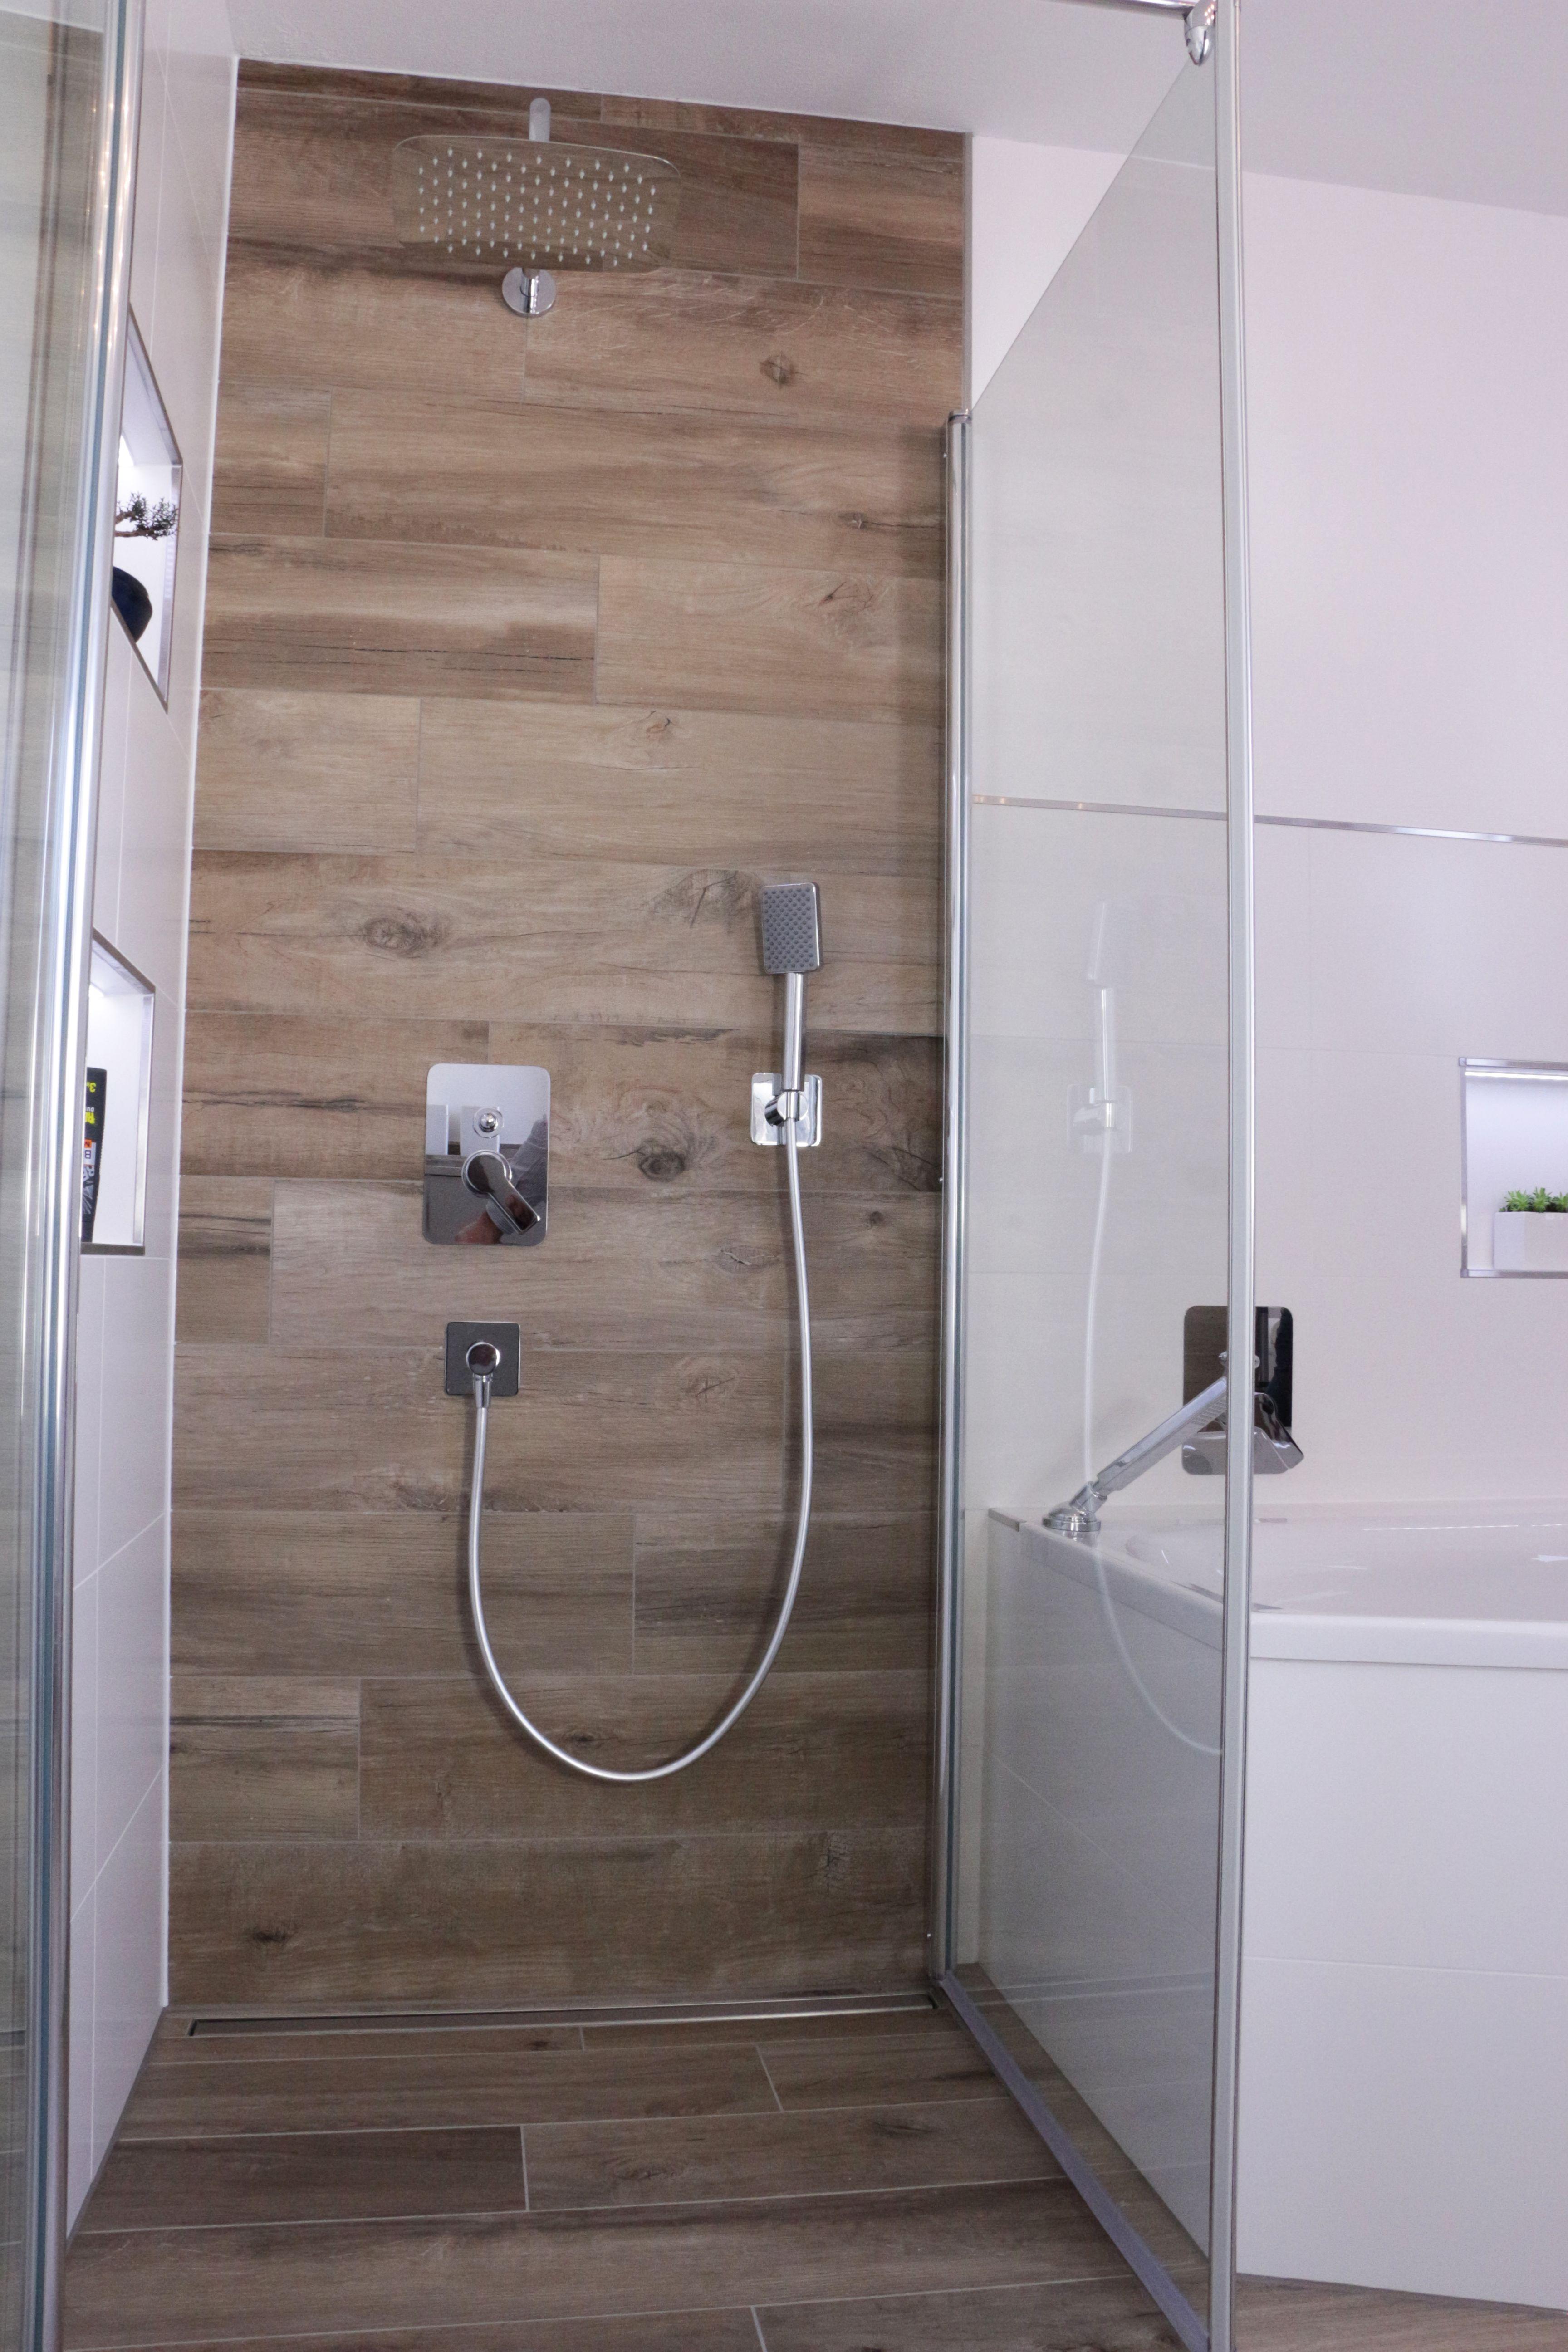 Regendusche Im Badezimmer Bad Fliesen Ideen Badezimmer Badezimmer Fliesen